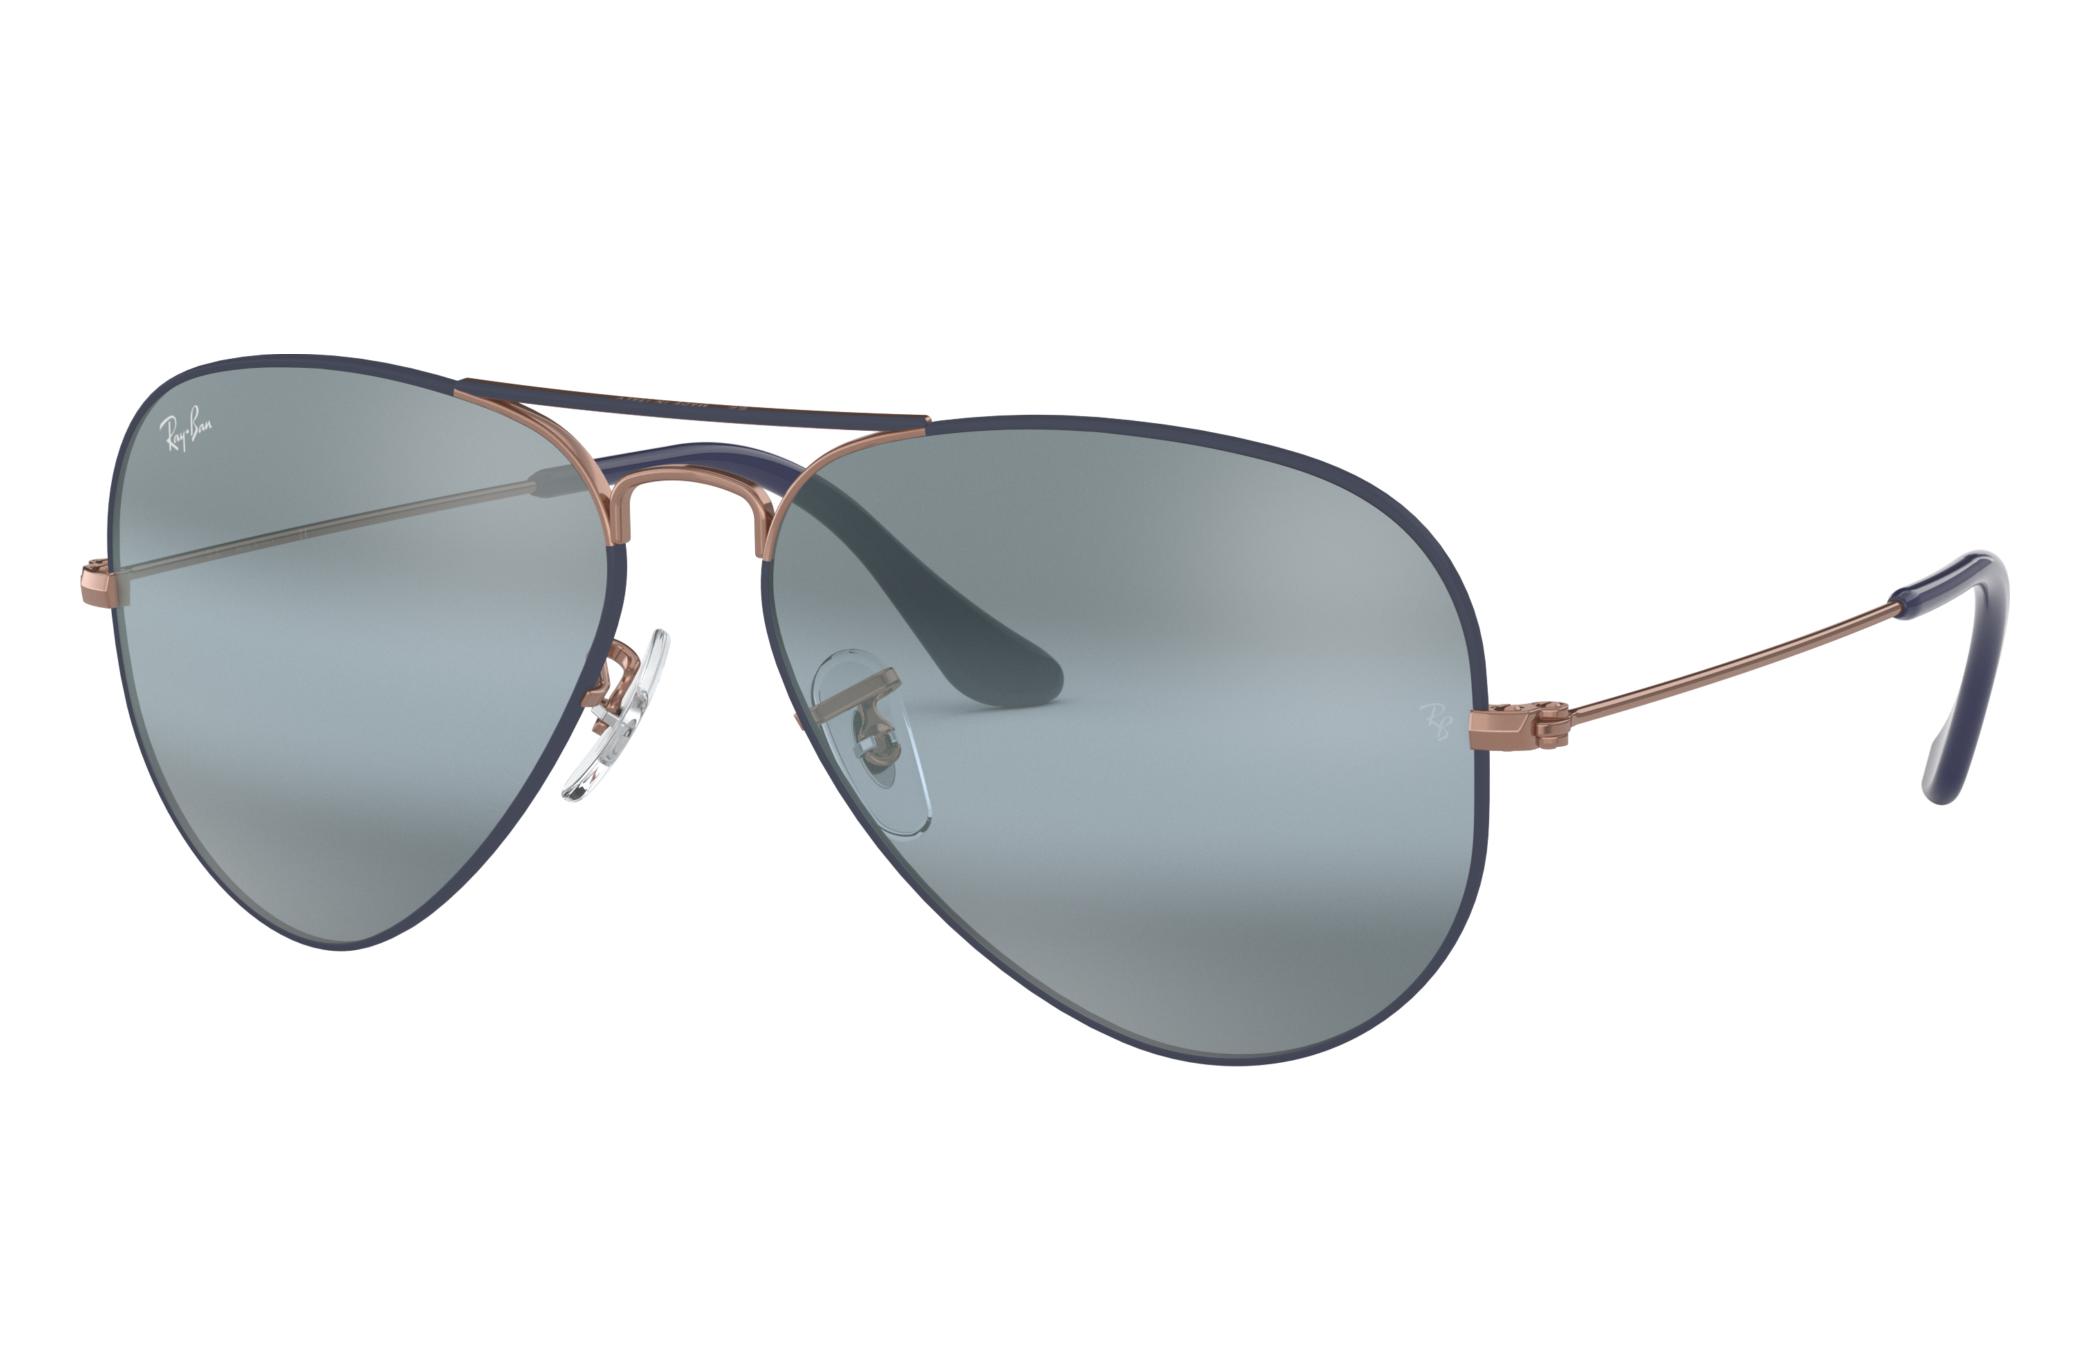 Ray-Ban Aviator Mirror Bronze-Copper, Blue Lenses - RB3025